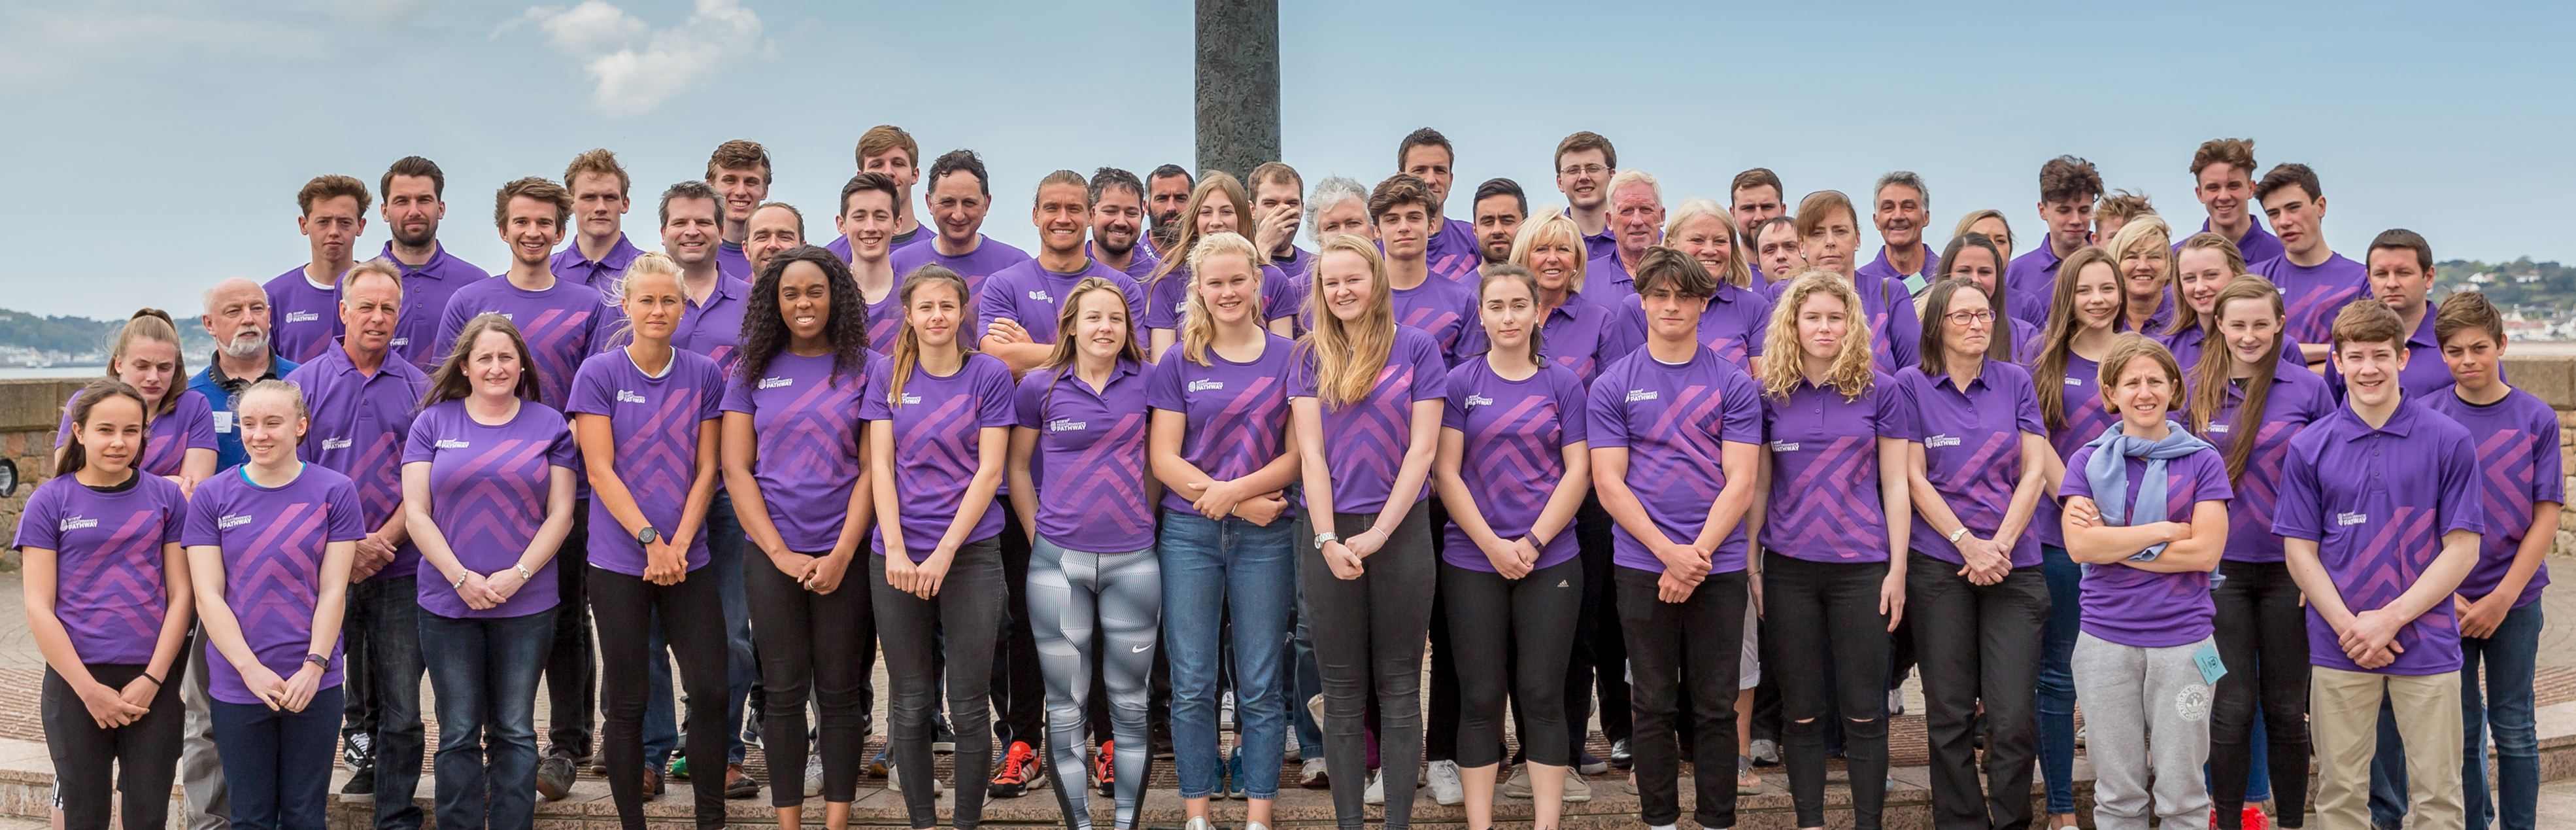 PP-team-image